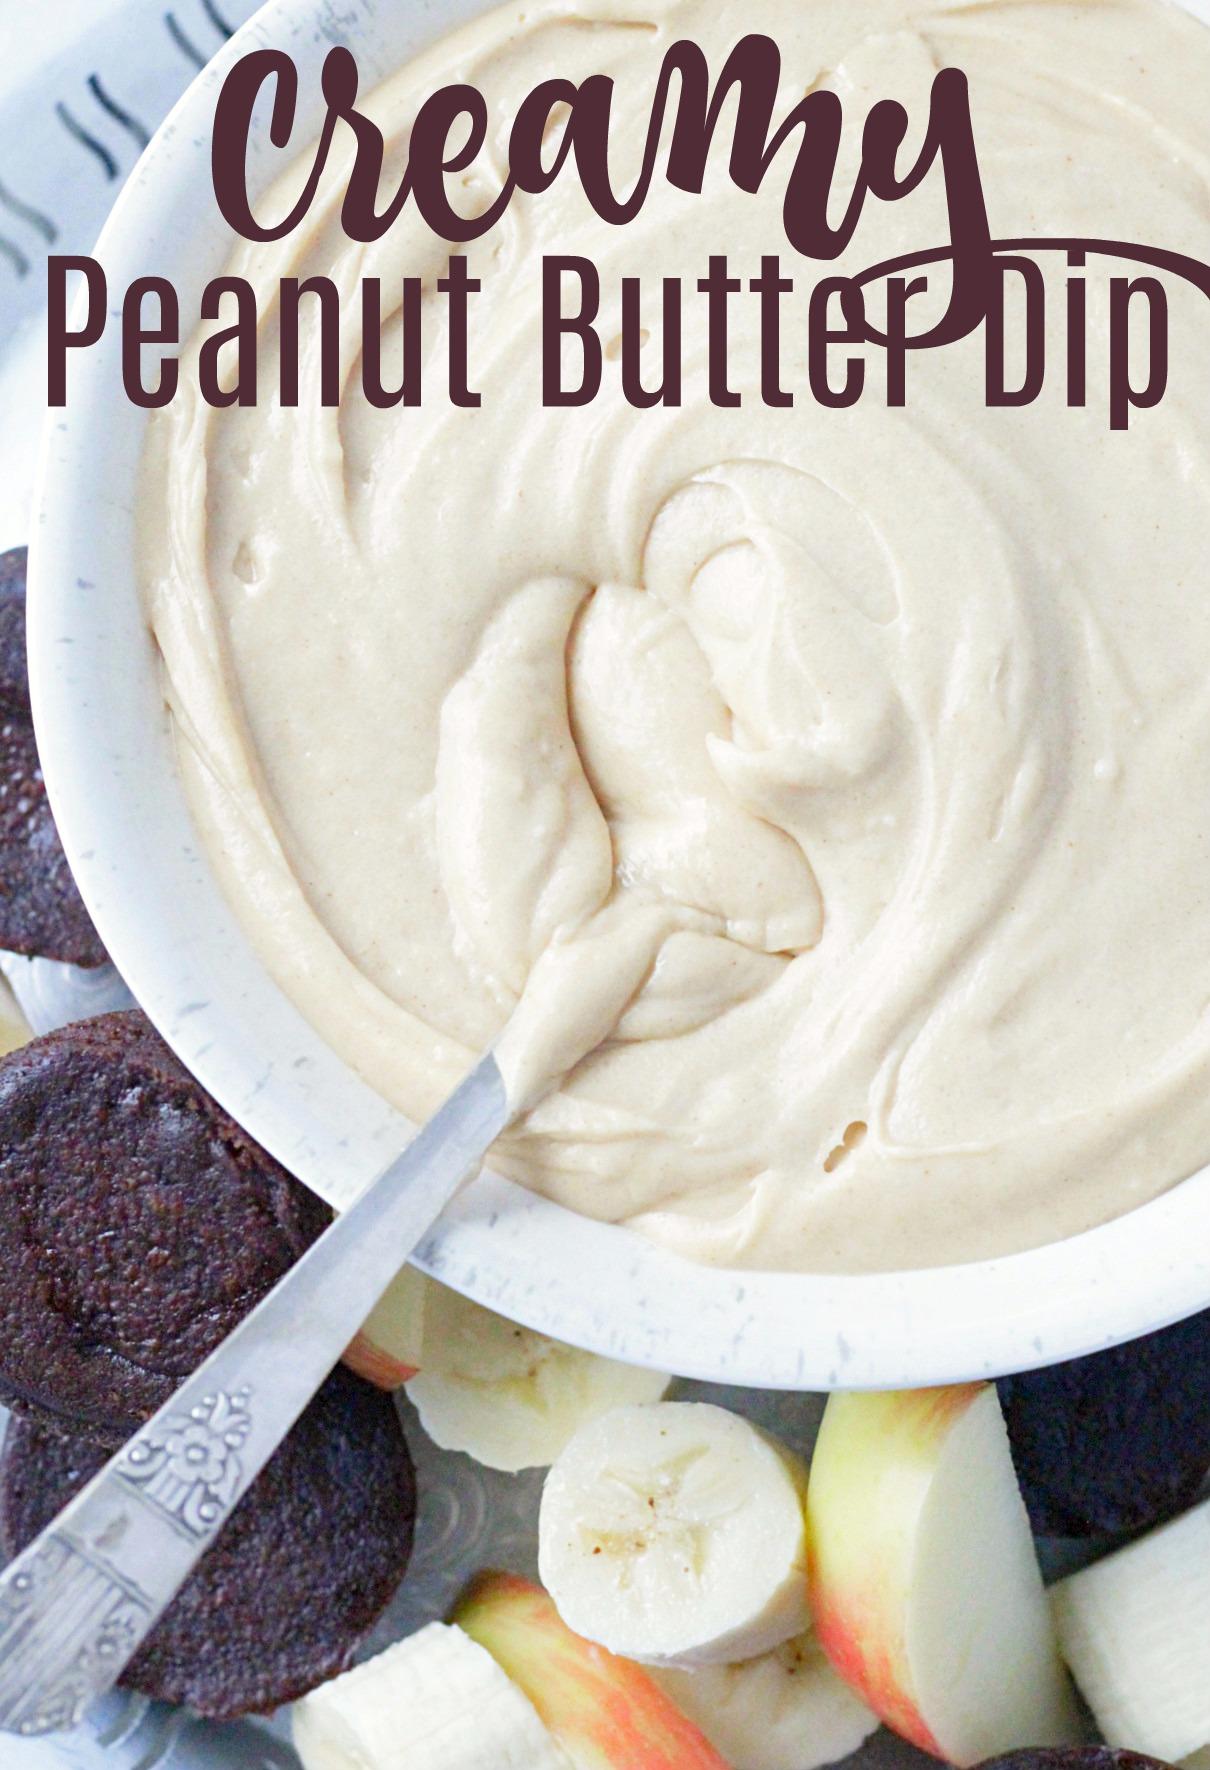 Creamy Peanut Butter Dip (great dessert for parties)